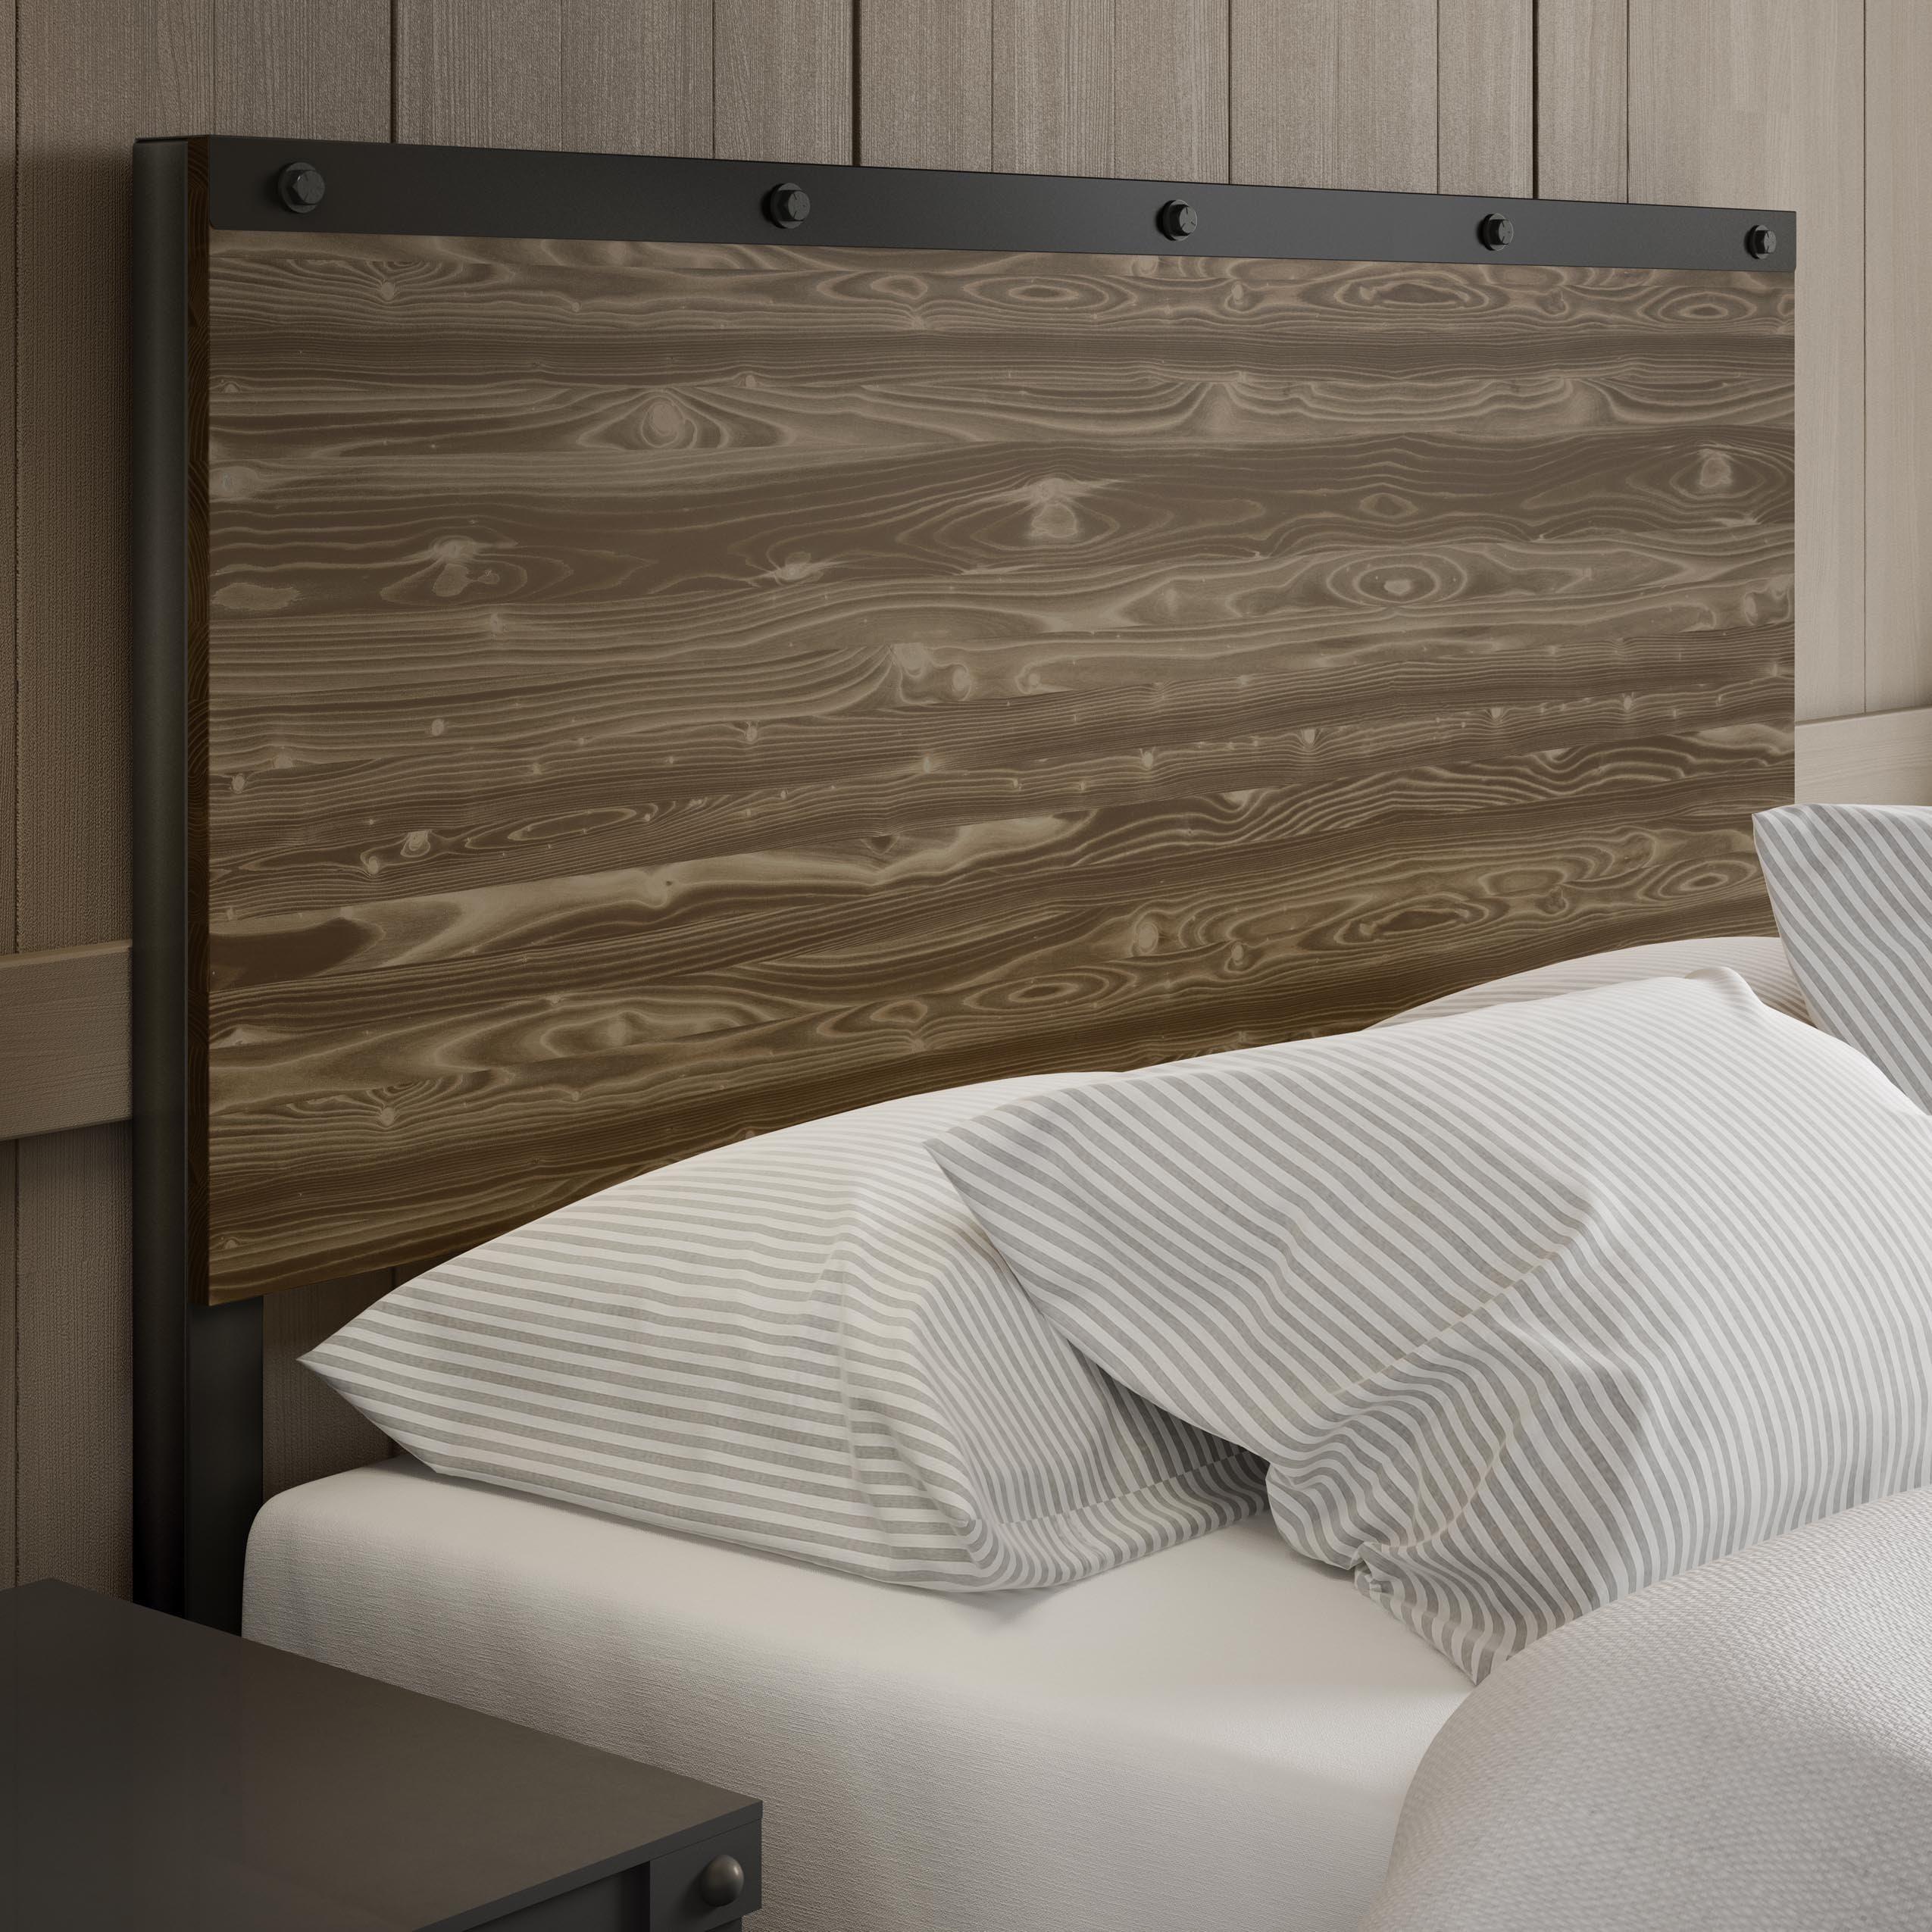 Amisco Winkler Full Size Metal Headboard with Wood (Semi-...